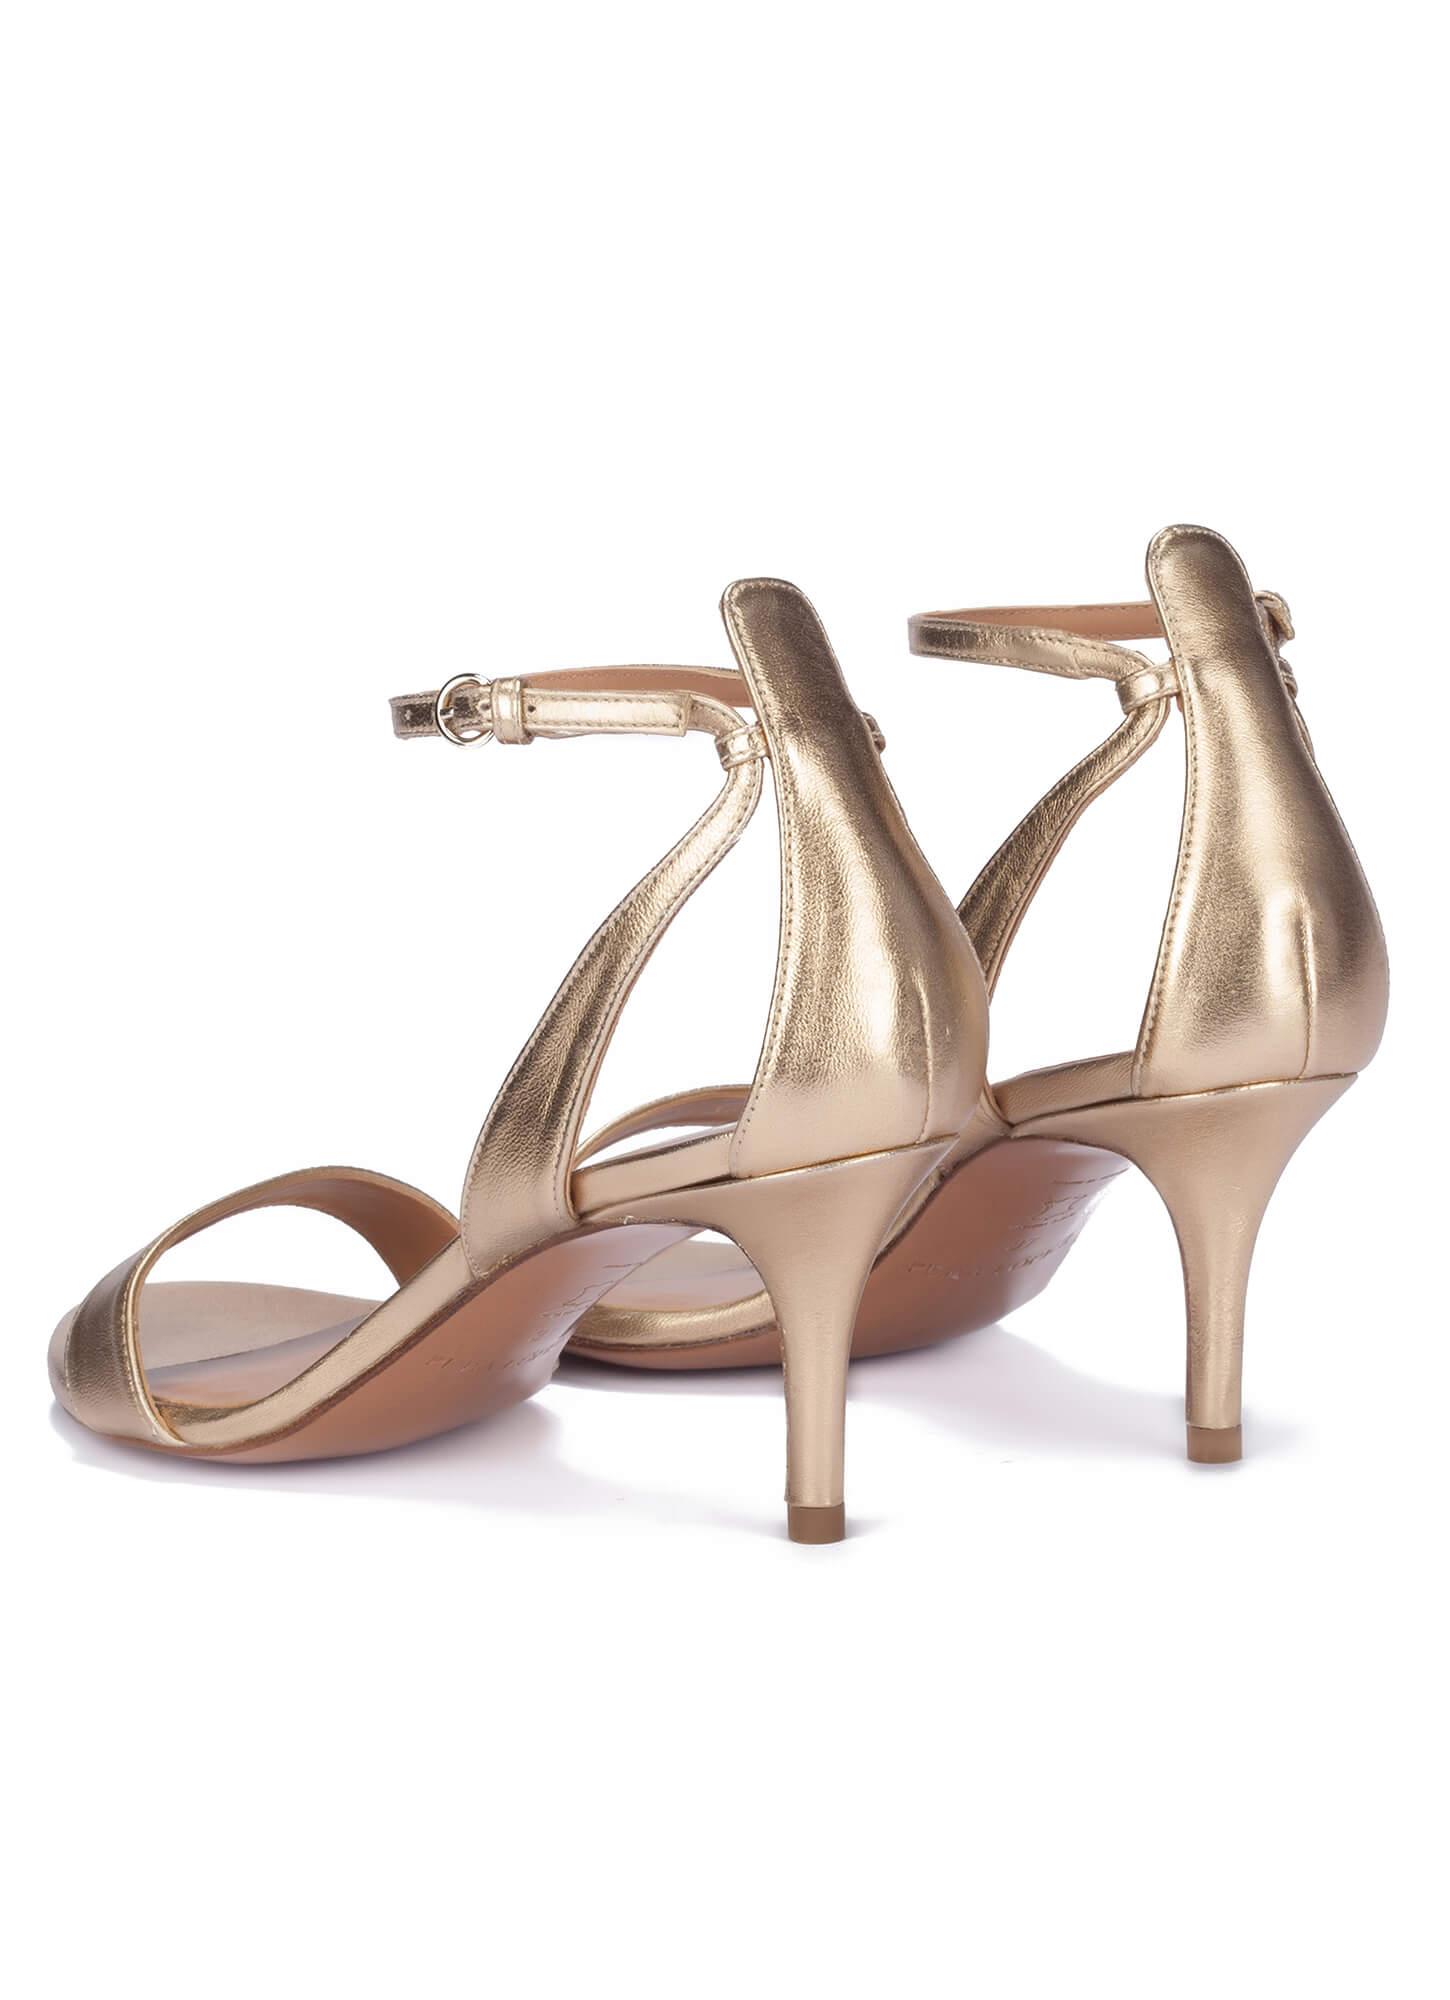 15be2ddf64e1 Mid heel sandals in gold leather - online shoe store Pura Lopez. Fantine Pura  López